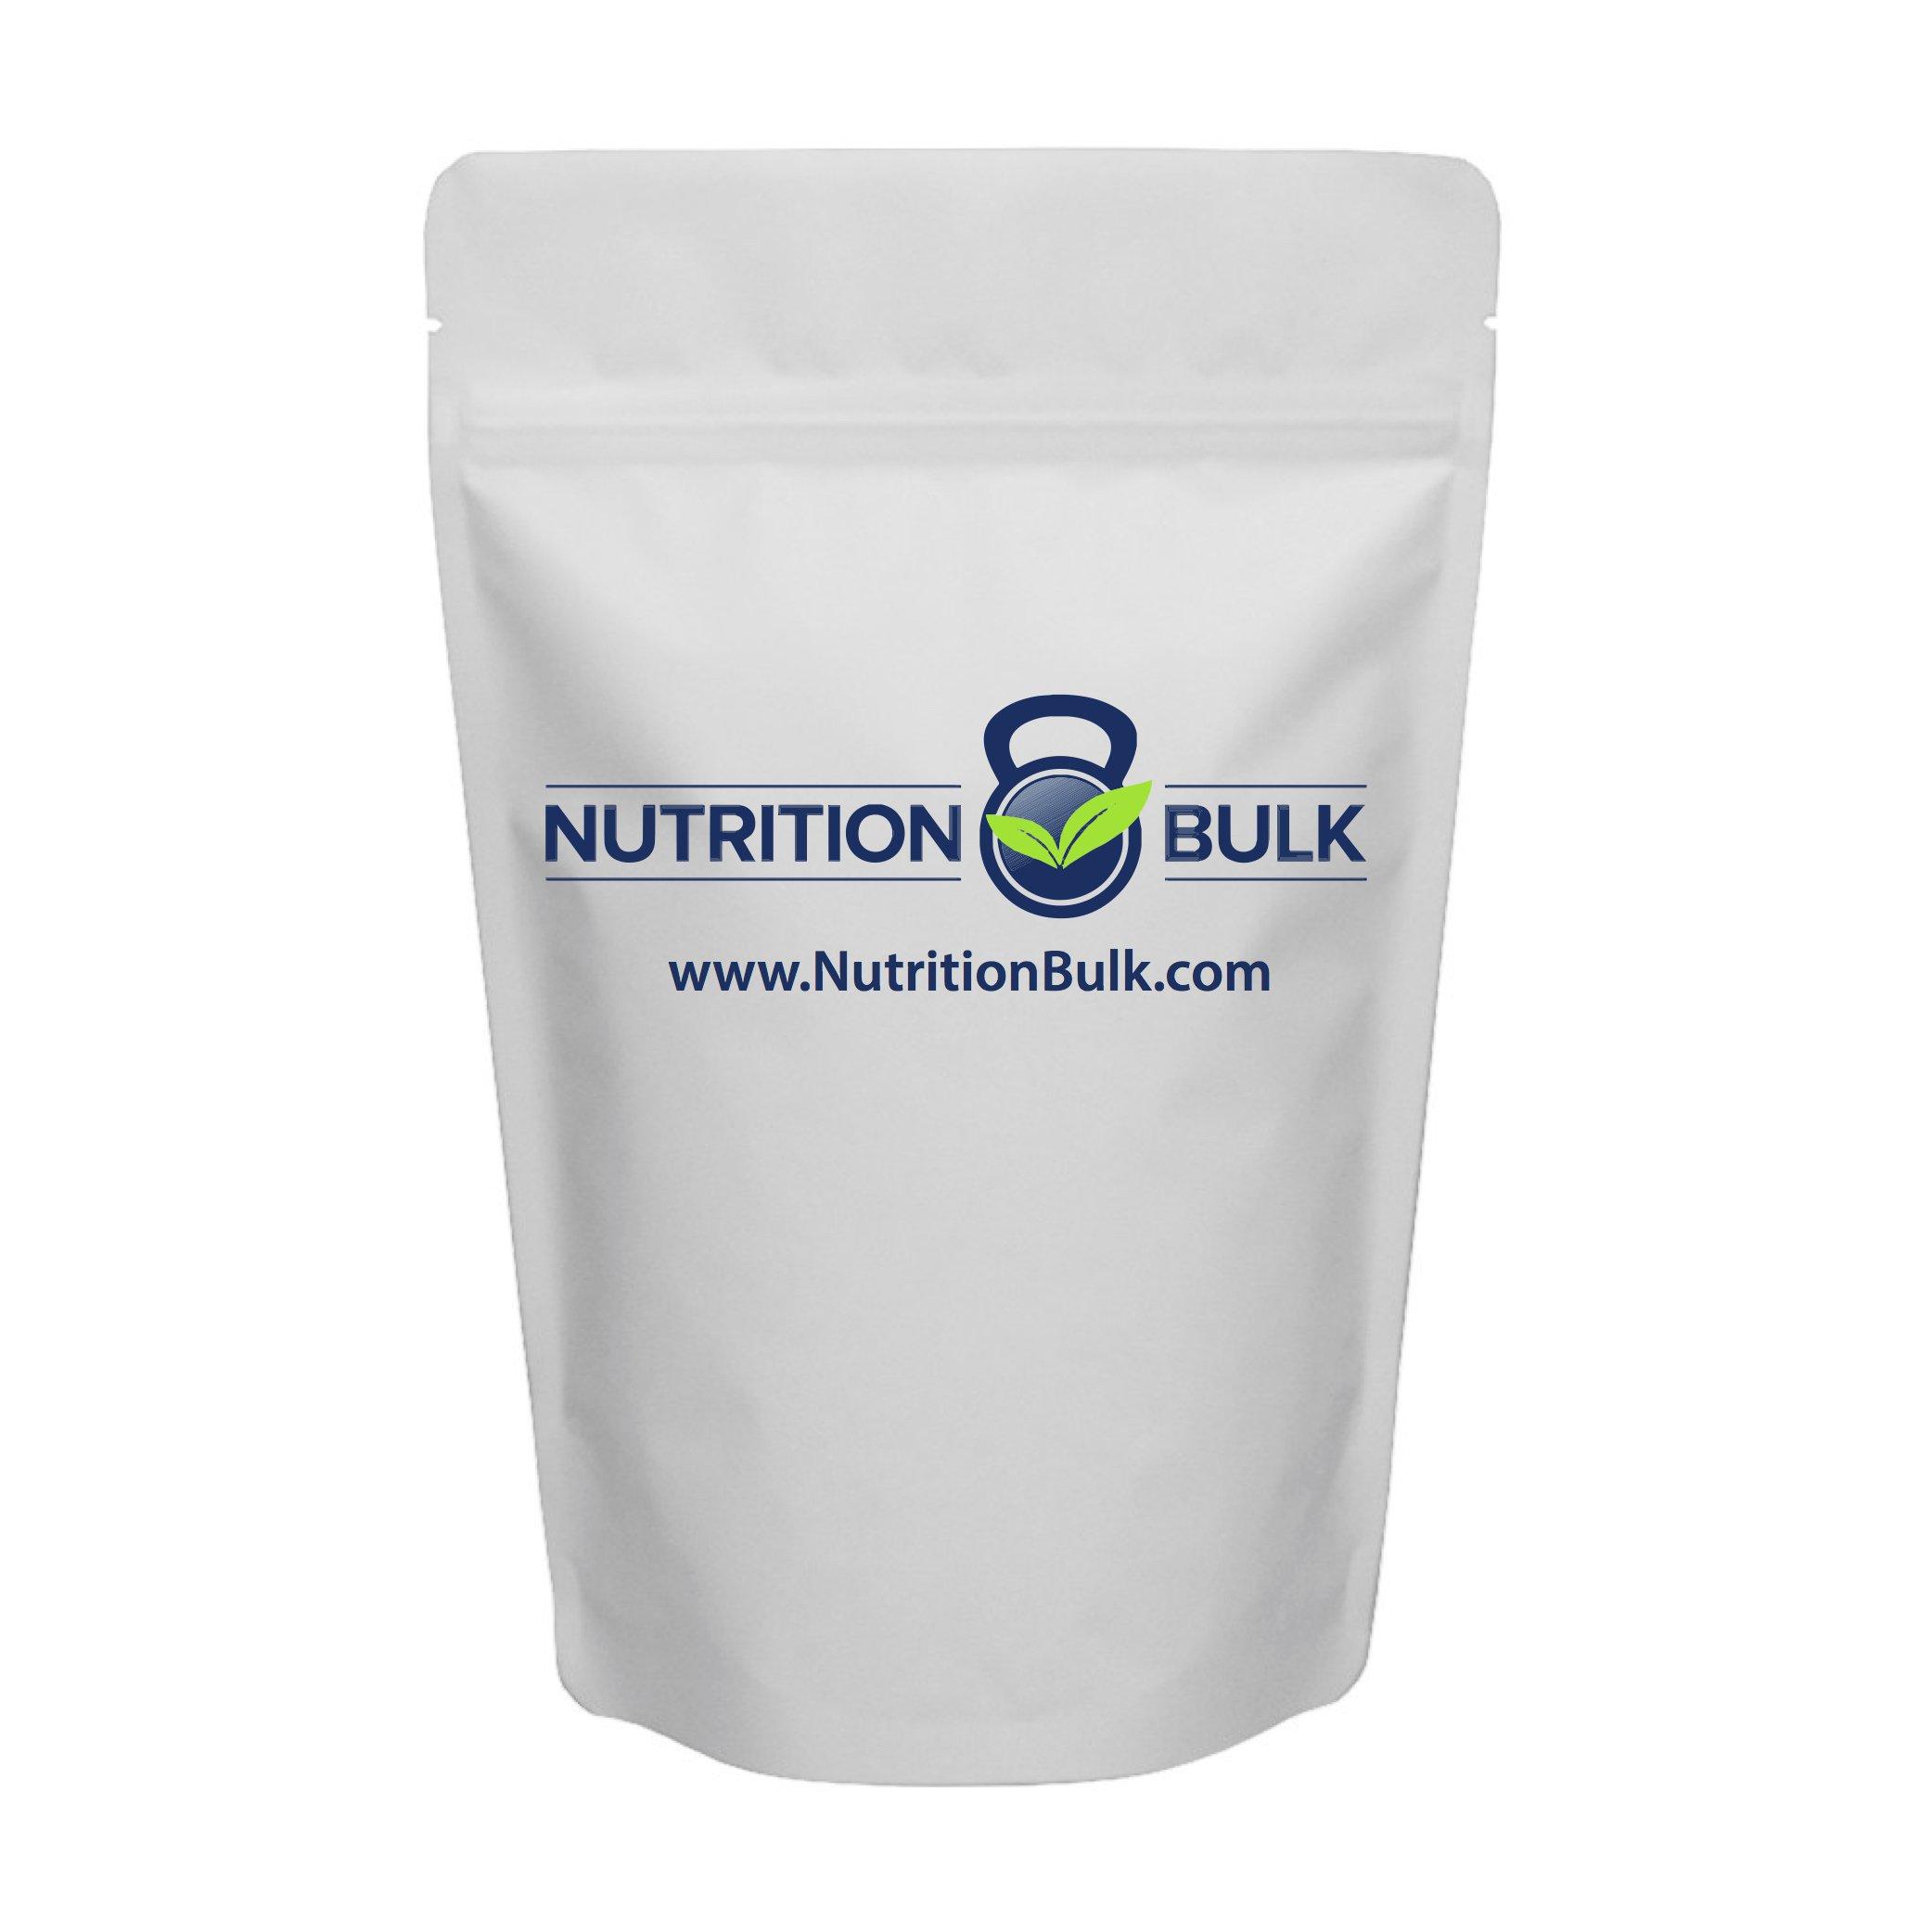 L-Lysine Powder, 5 lb Bulk, Resealable Bag, USP Pharmaceutical-Grade Dietary Supplement, 100% Pure L-Lysine HCl Amino Acid, No Fillers